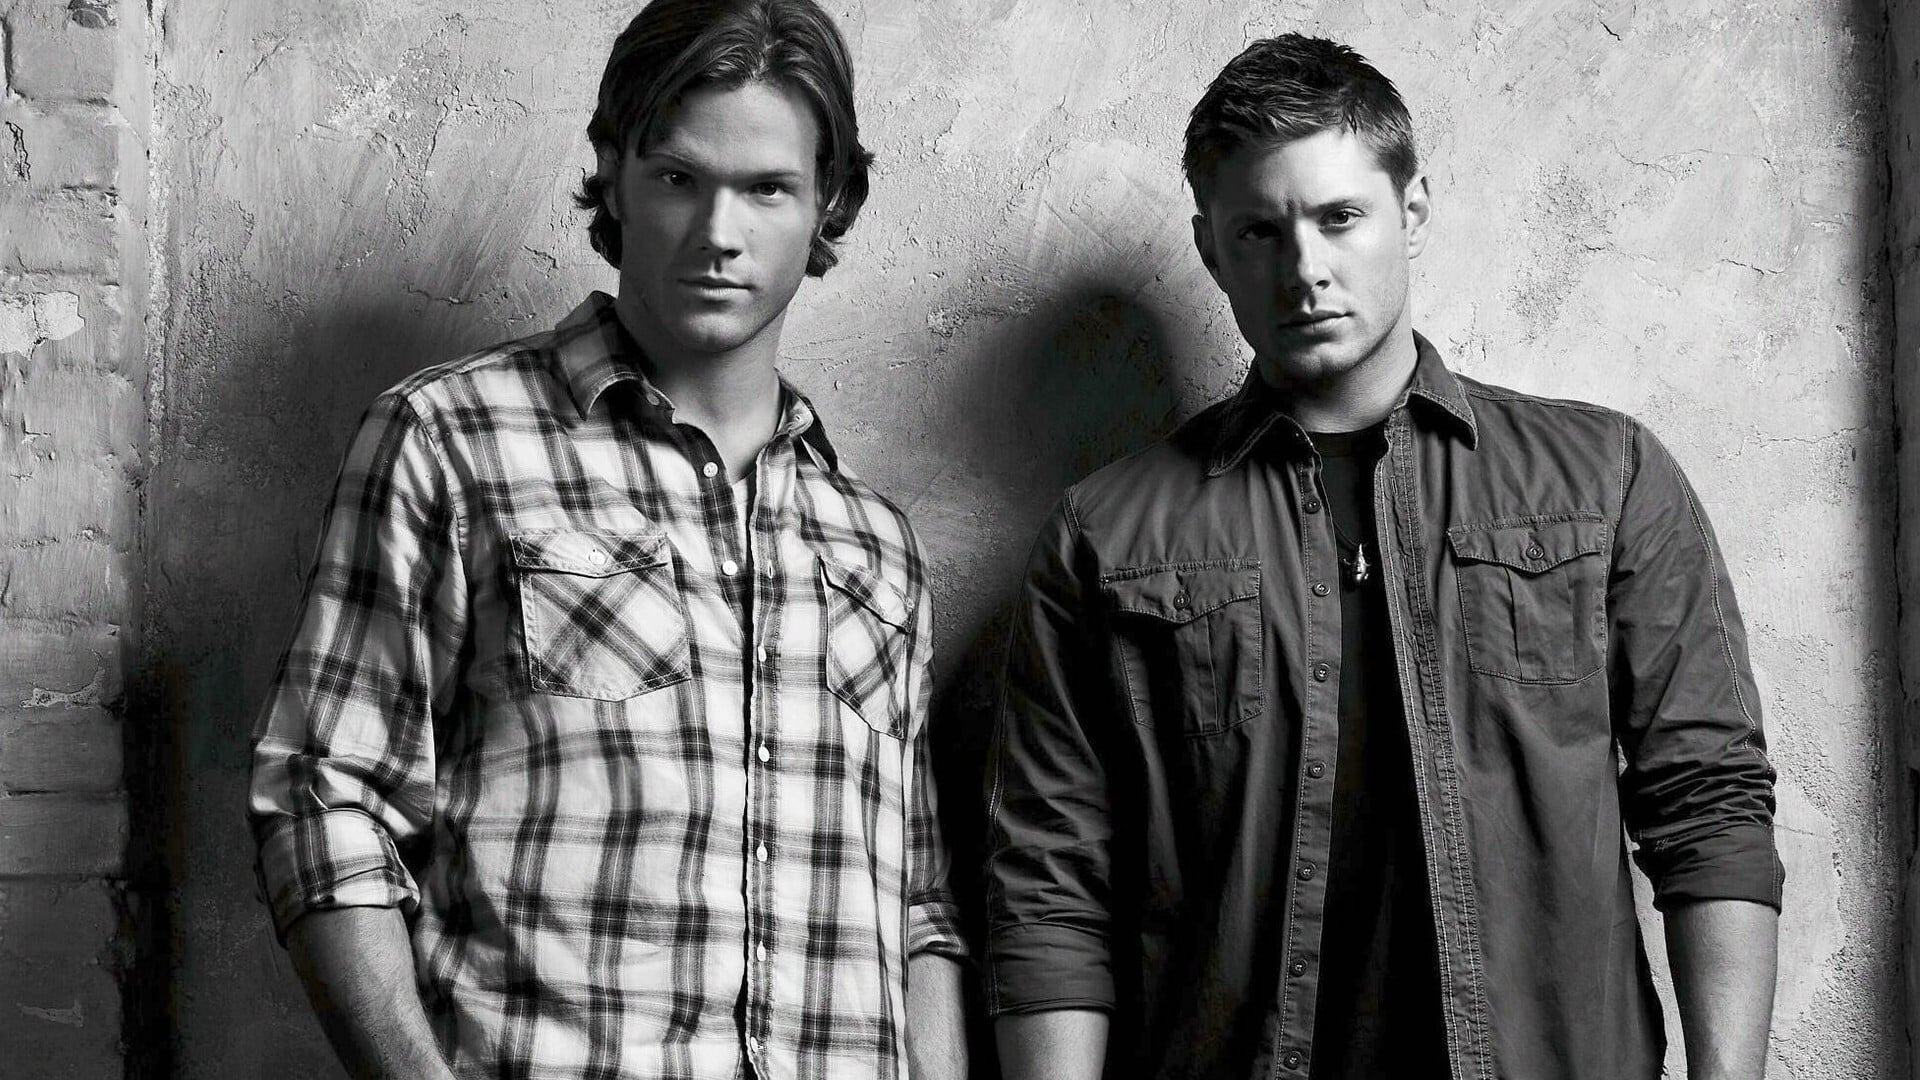 Supernatural - Season 12 Episode 19 The Future